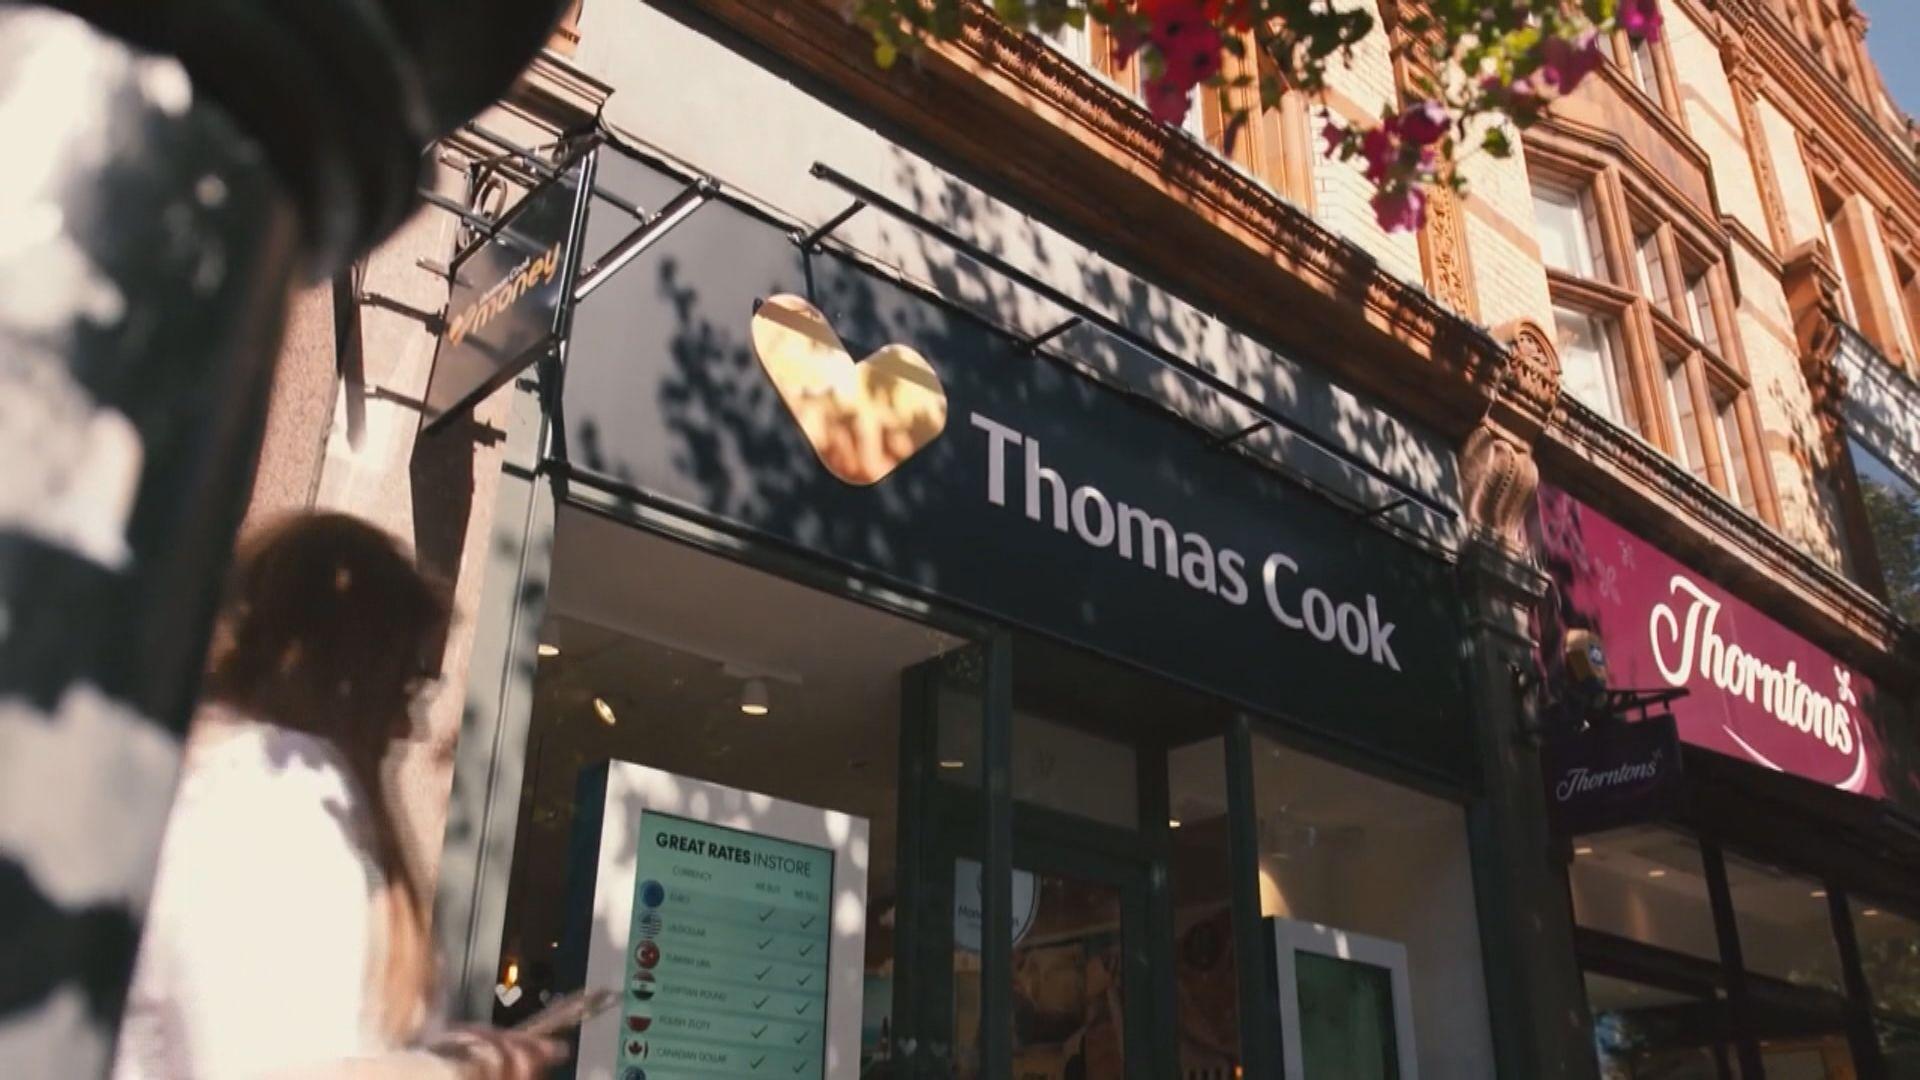 Thomas Cook倒閉 英政府負擔國民回國及住宿費用